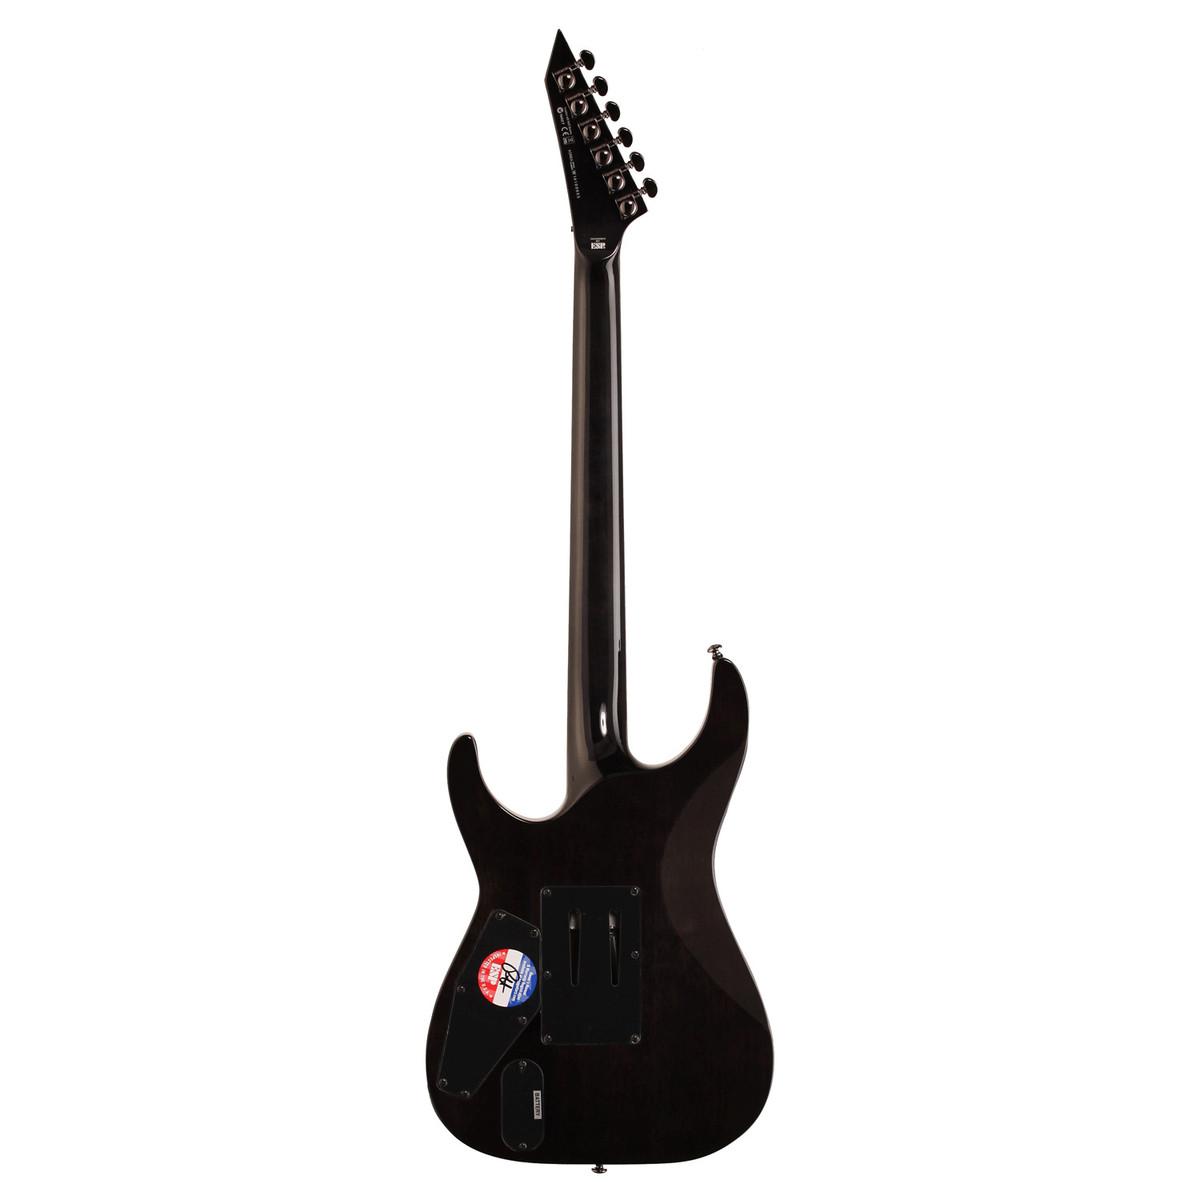 Esp Ltd Mh 1001 Electric Guitar See Thru Black Ex Demo At Gear4music Emg 81 85 Humbucker Active Pickups Set Loading Zoom